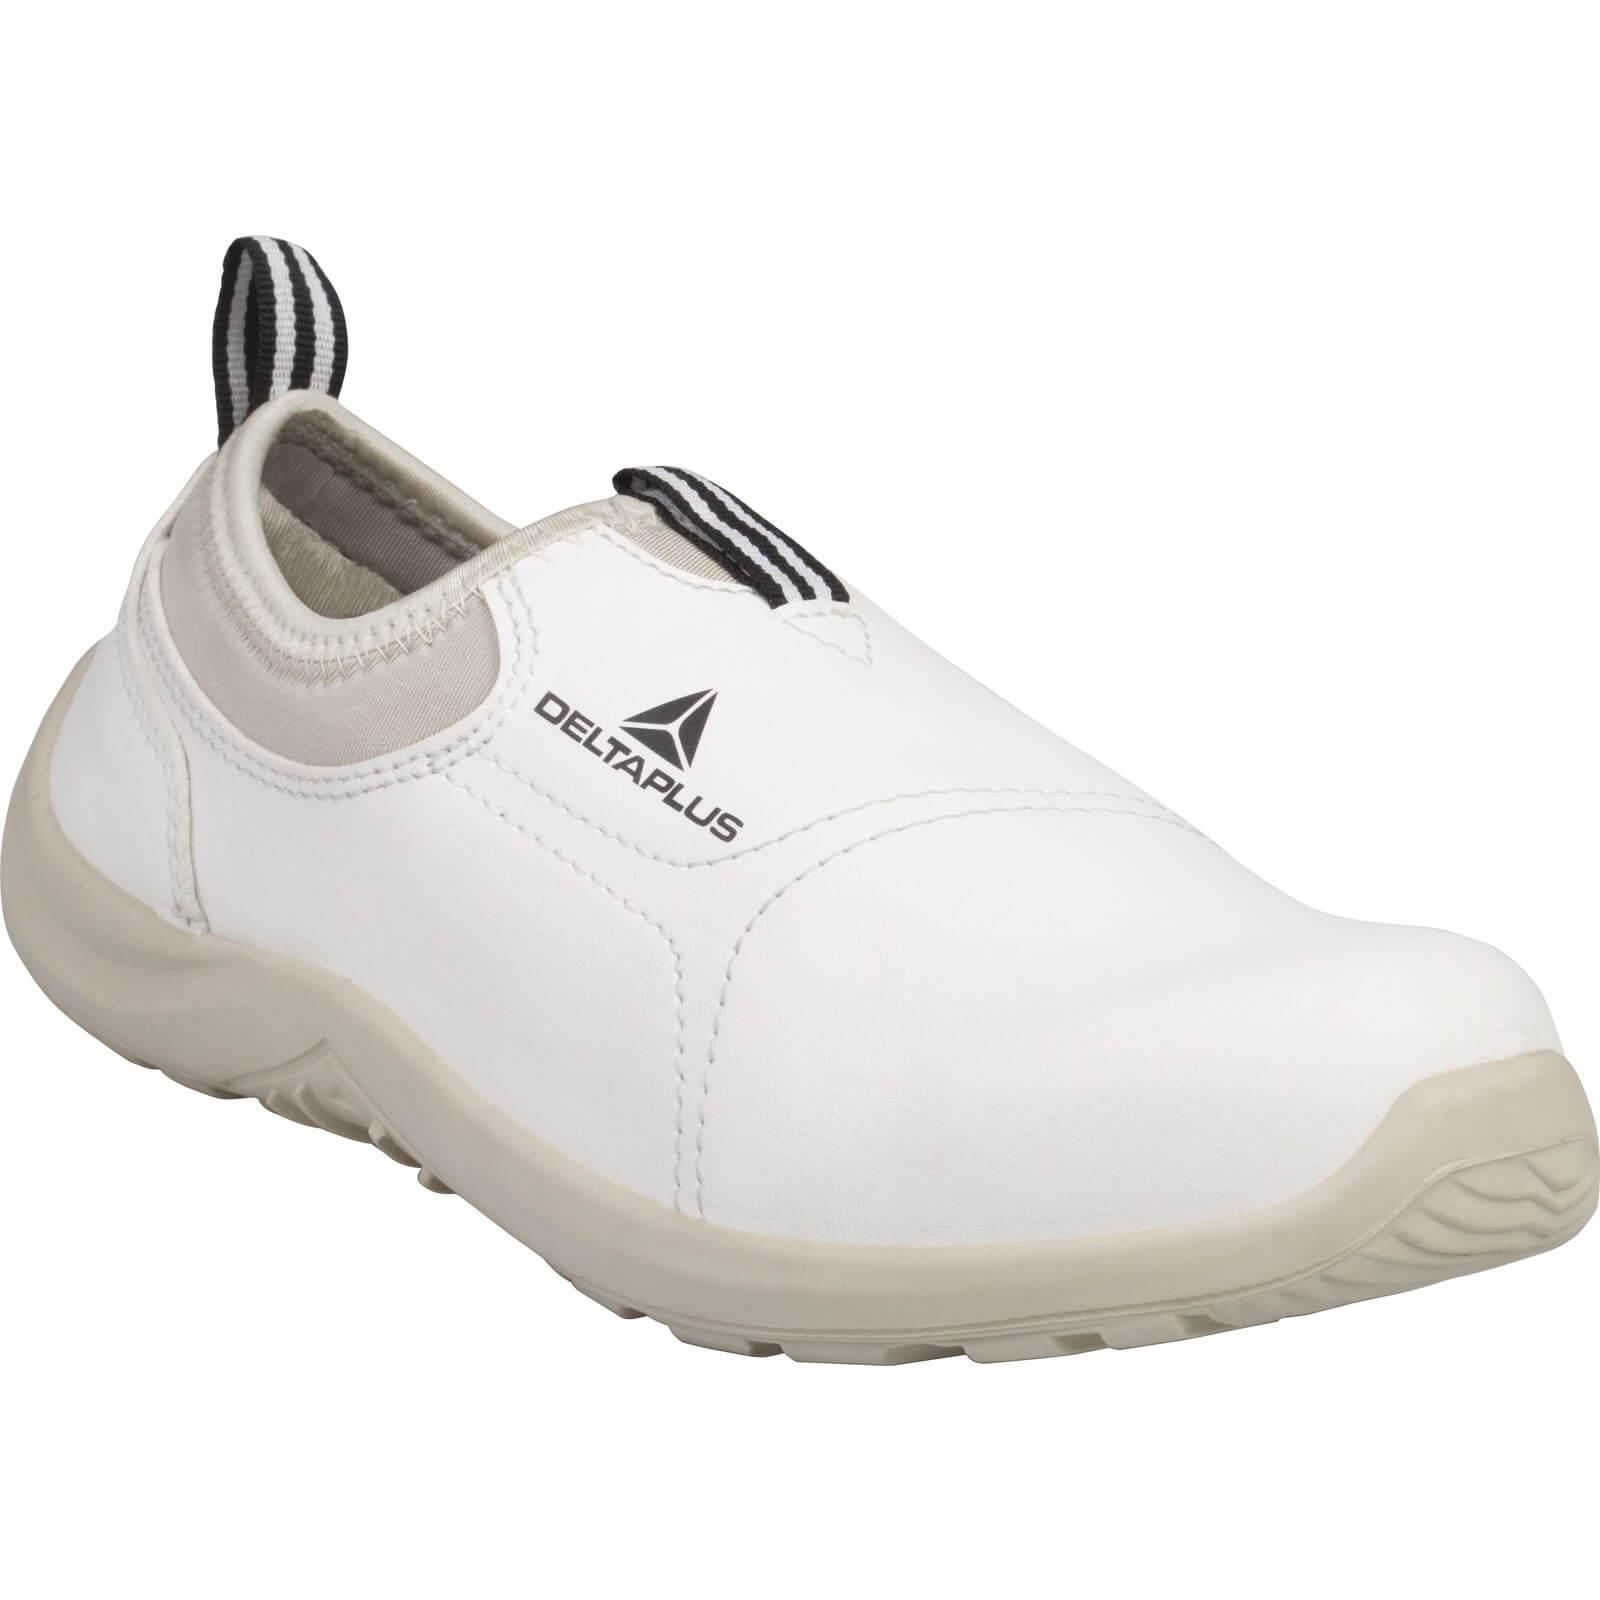 Chaussure de cuisine loafer...